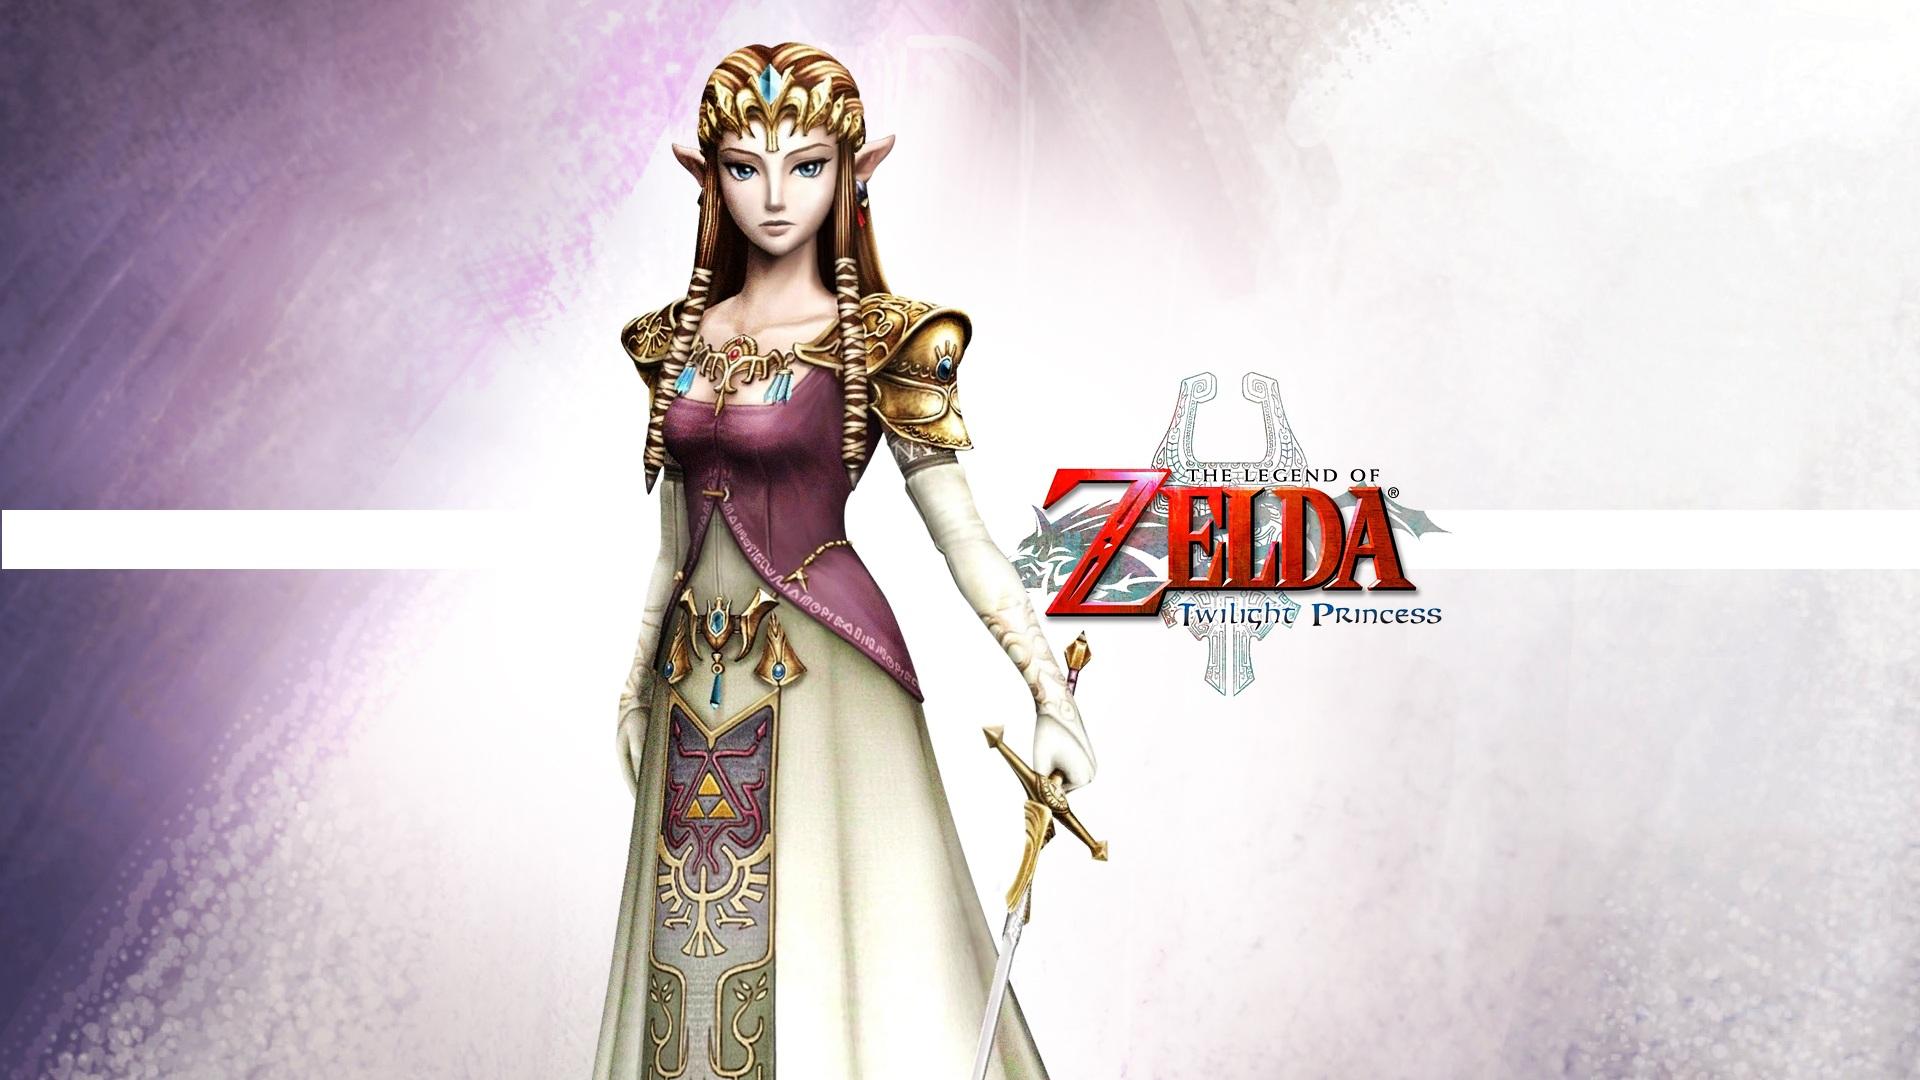 Report content Zelda   Twilight Princess Wallpapers view original 1920x1080